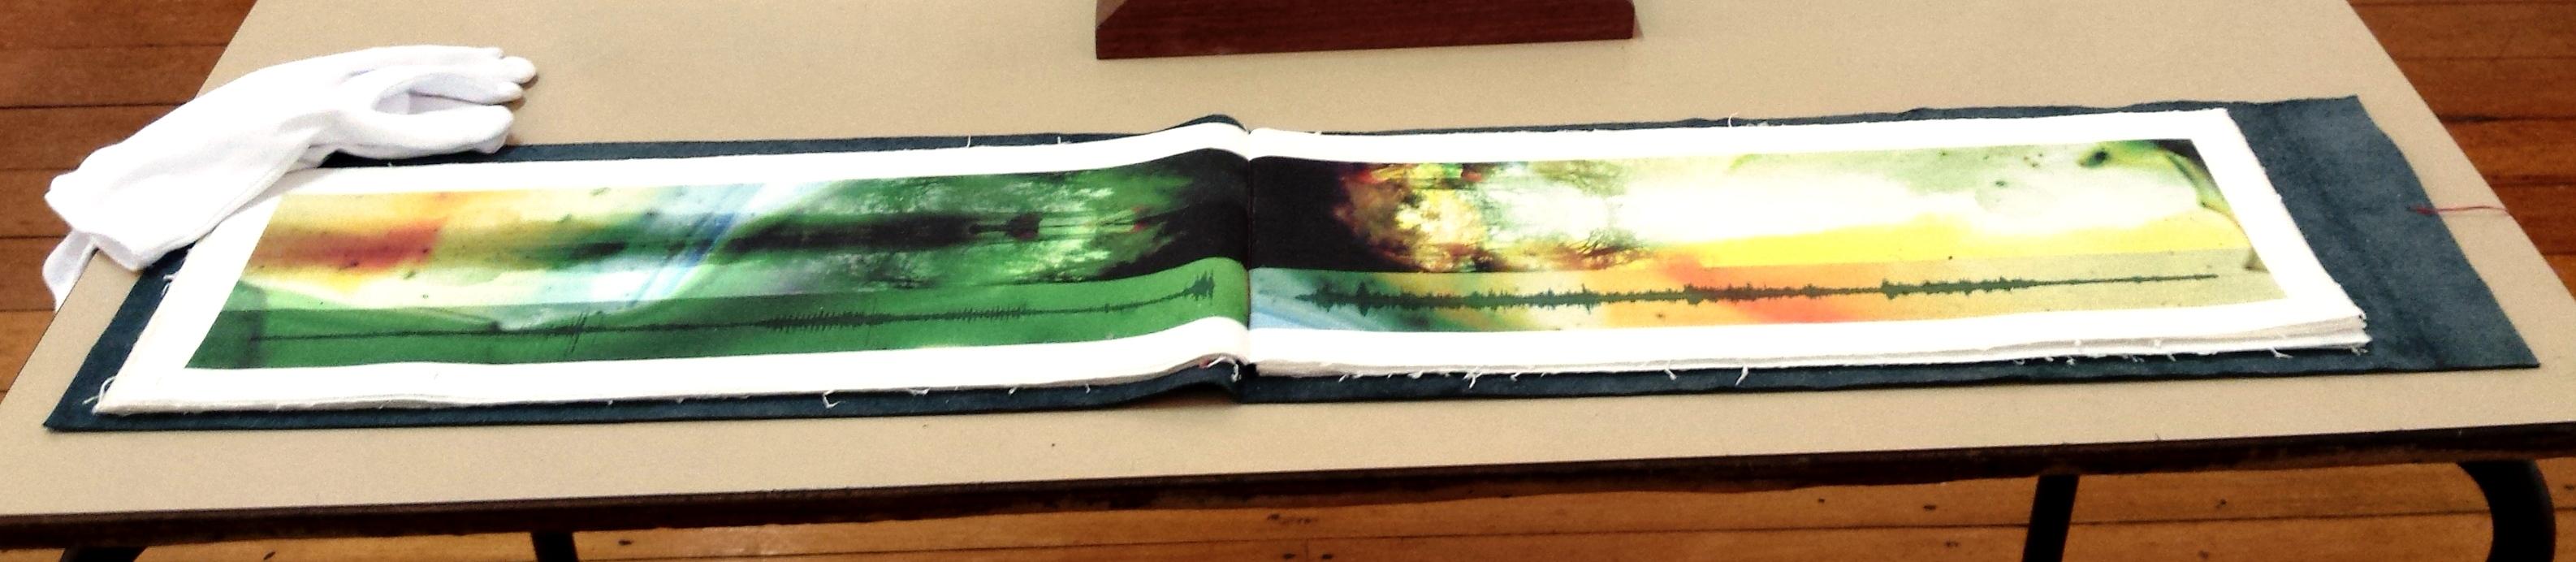 log book the river hid - codex